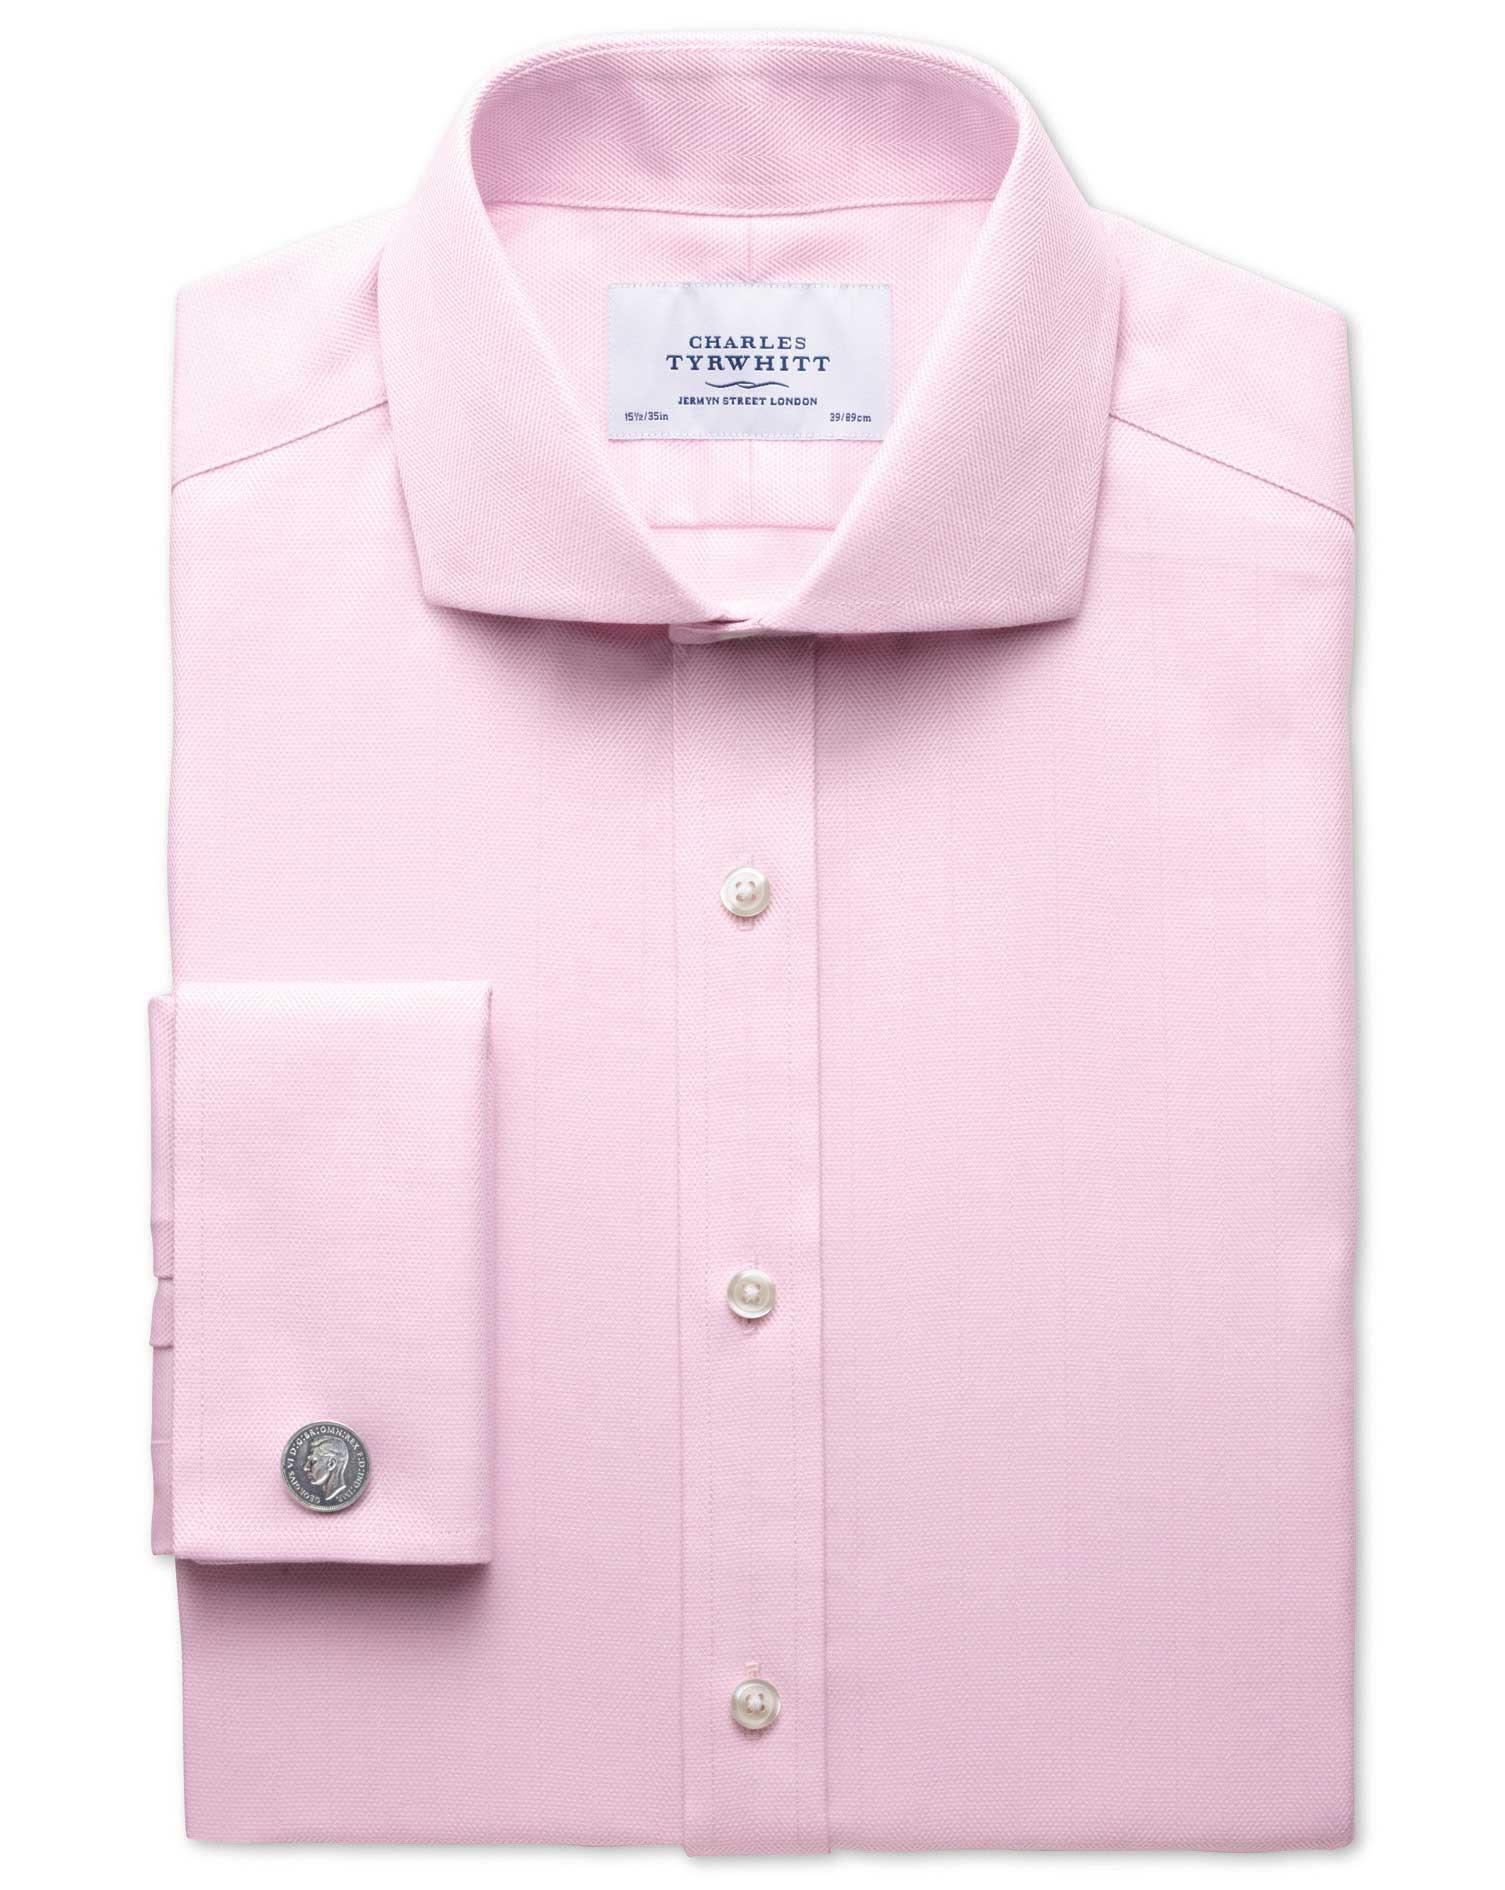 Slim Fit Cutaway Collar Non-Iron Herringbone Light Pink Cotton Formal Shirt Single Cuff Size 16/38 b